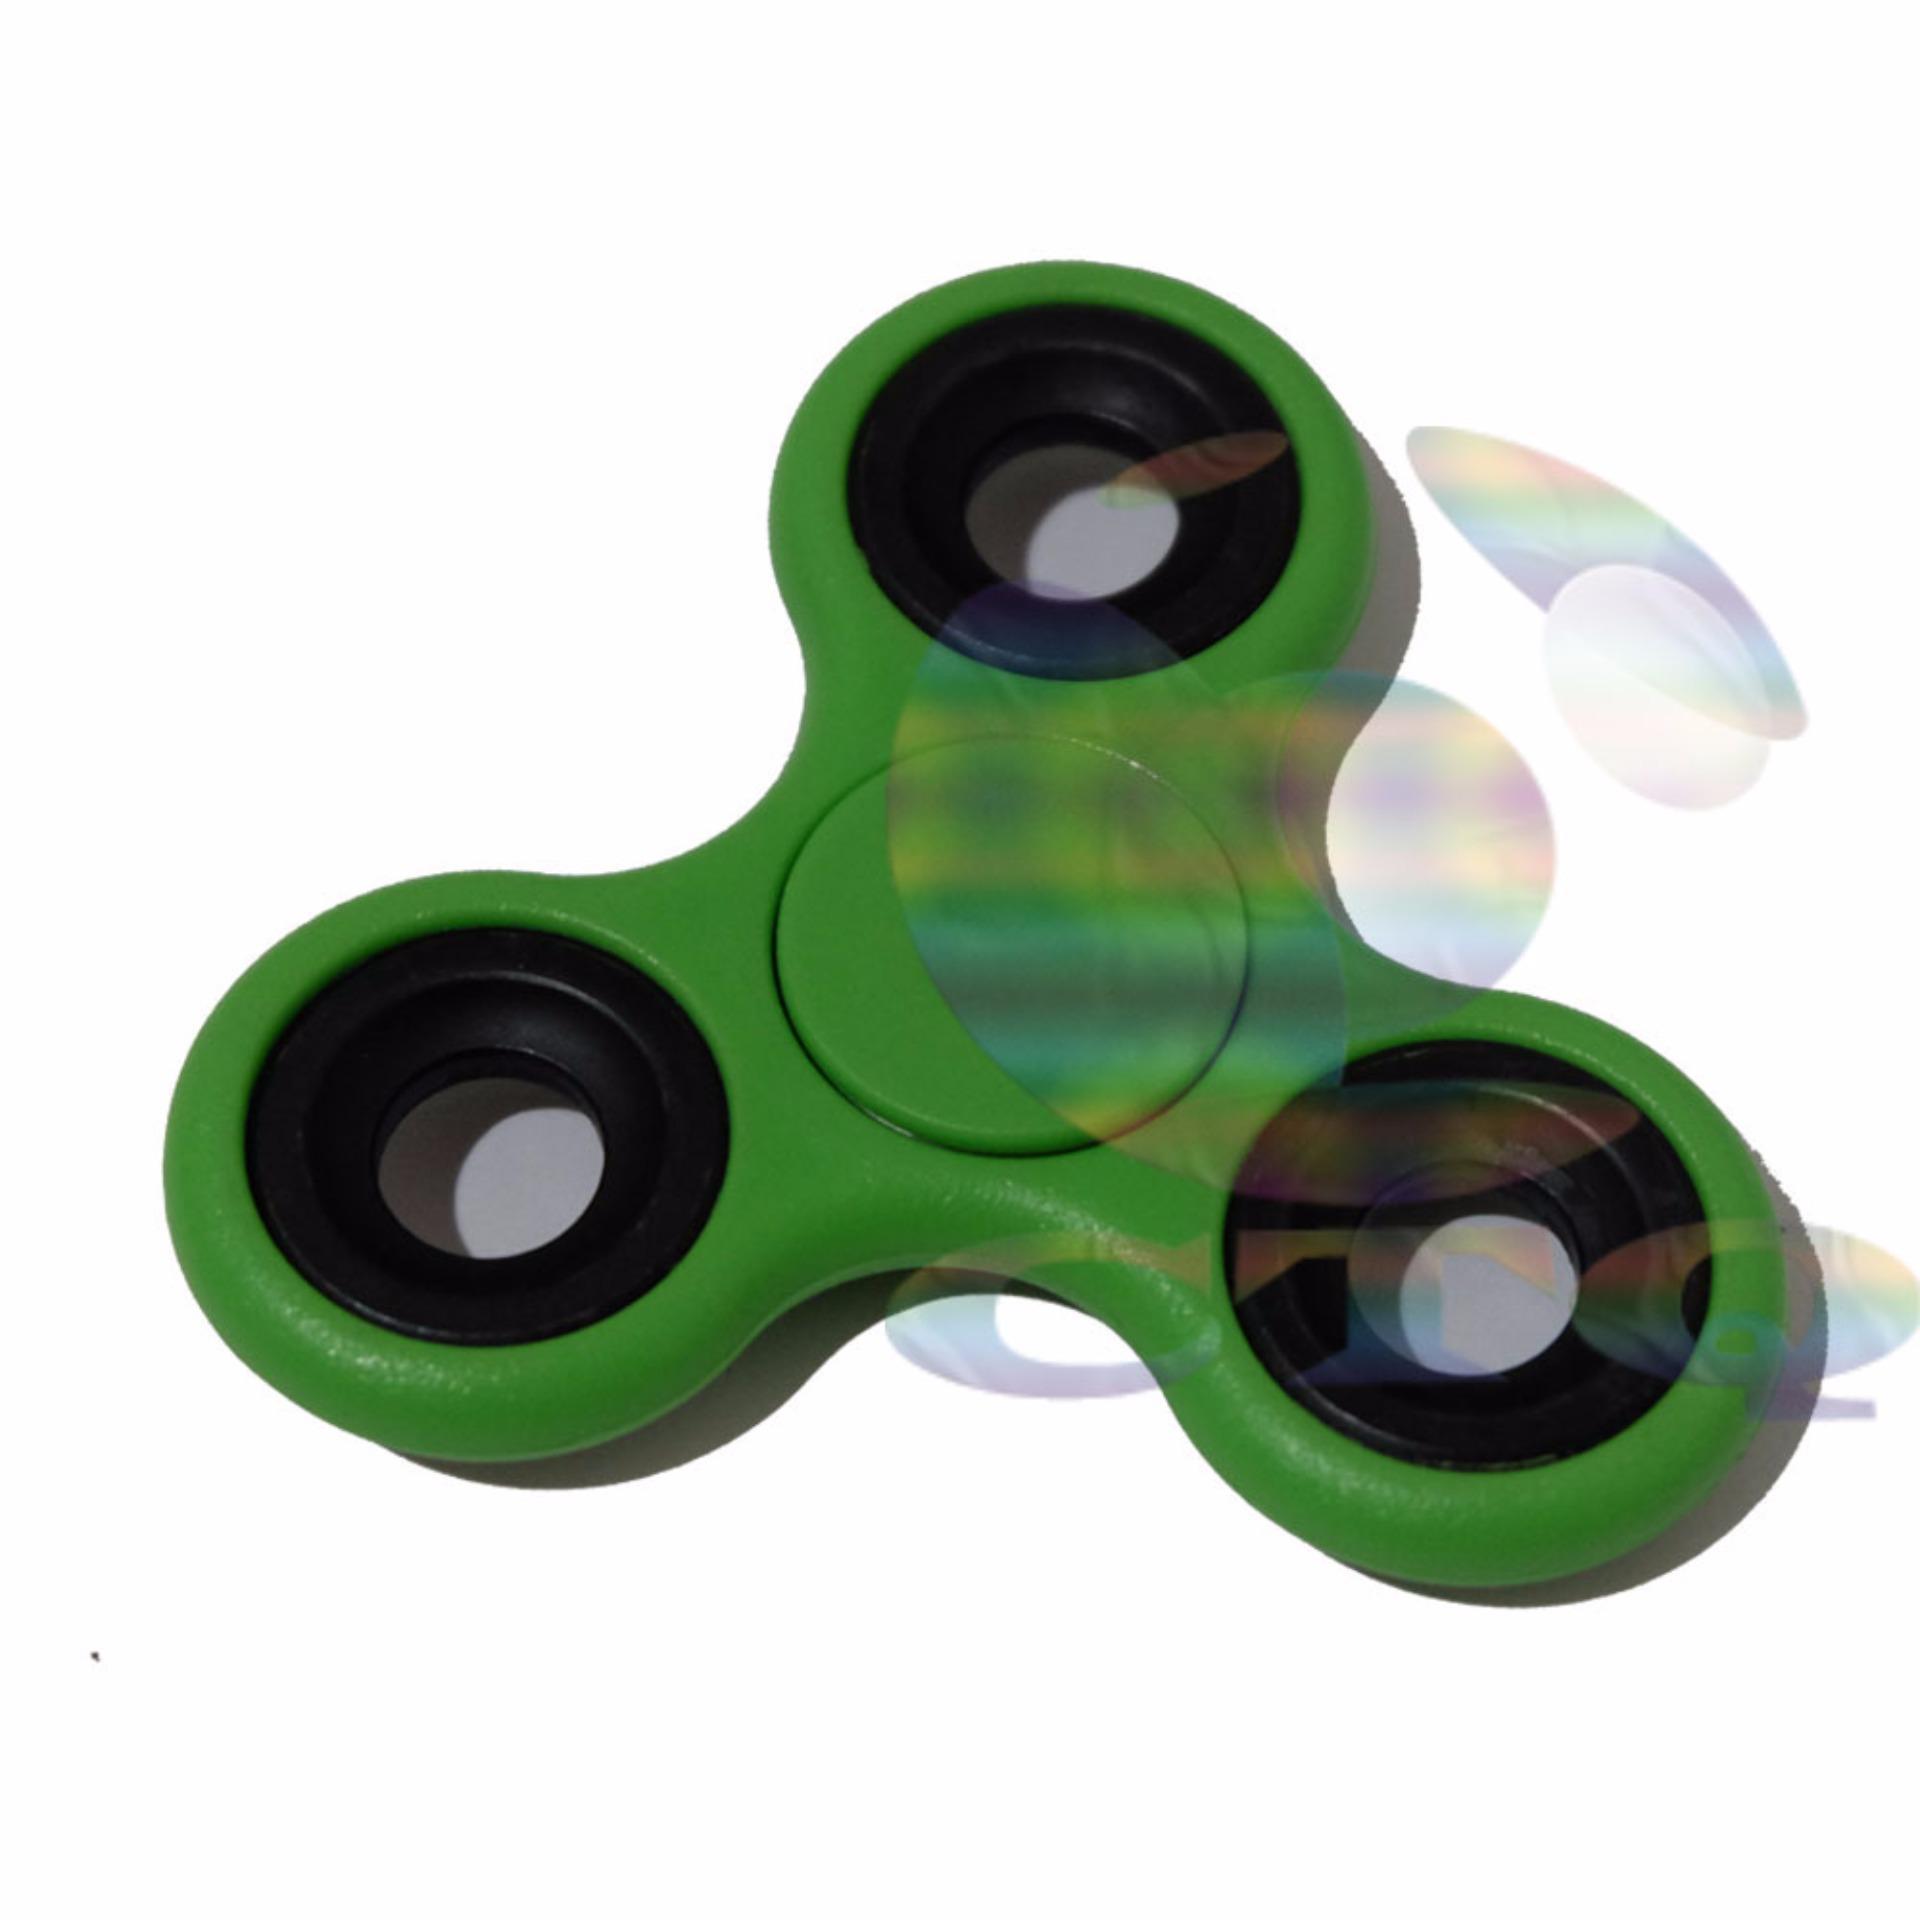 Cantiq Fidget Spinner Ceramic Mainan Tri-Spinner Ball Bearing EDC Sensory Mainan Penghilang Kebiasaan Buruk